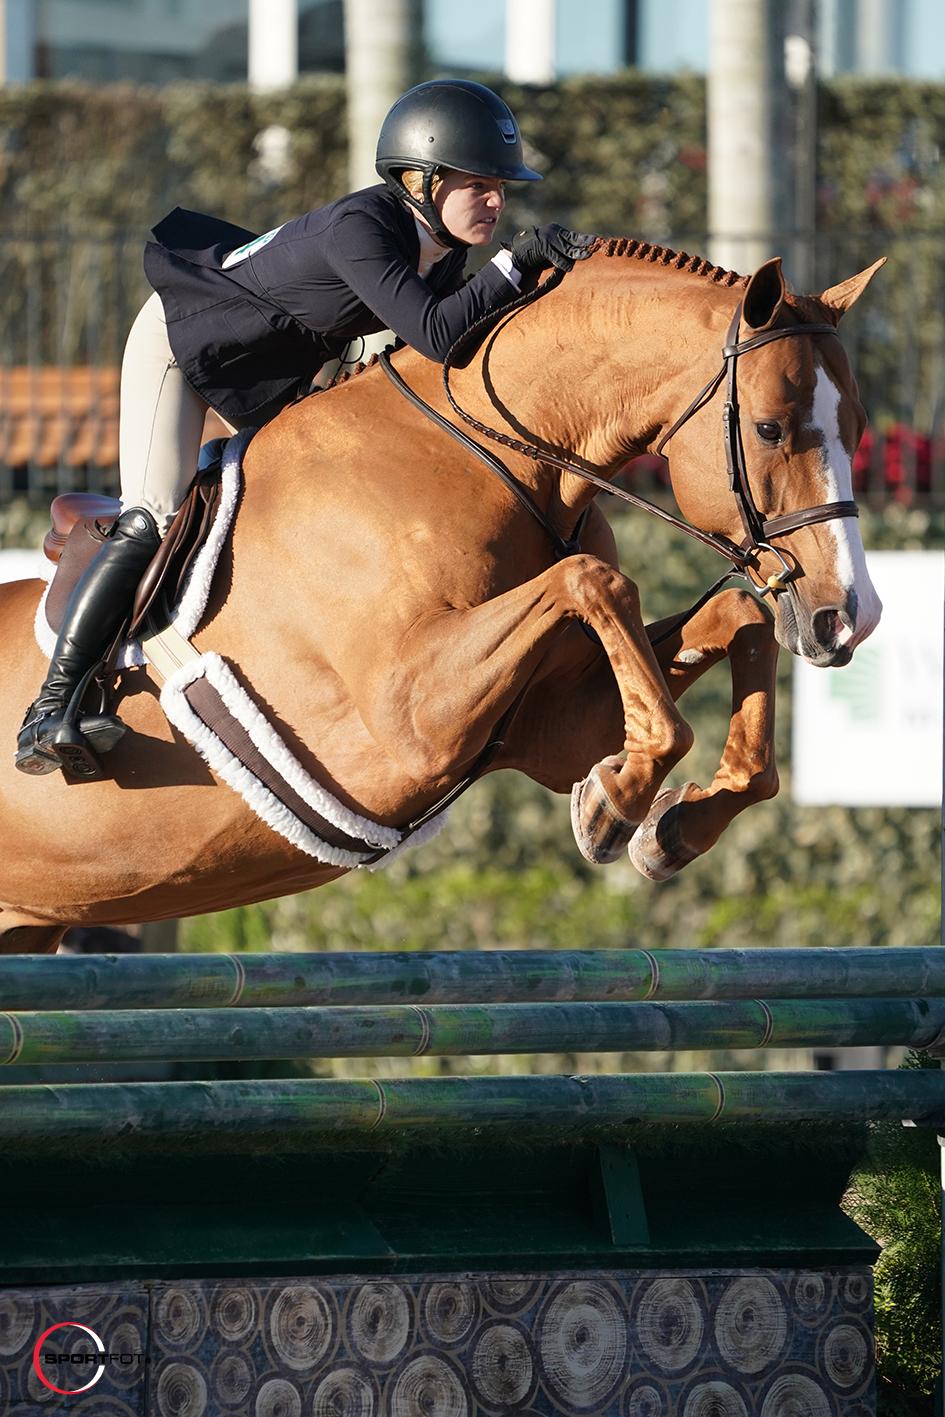 Garfield and Sophie Gochman 431_3871 Sportfot